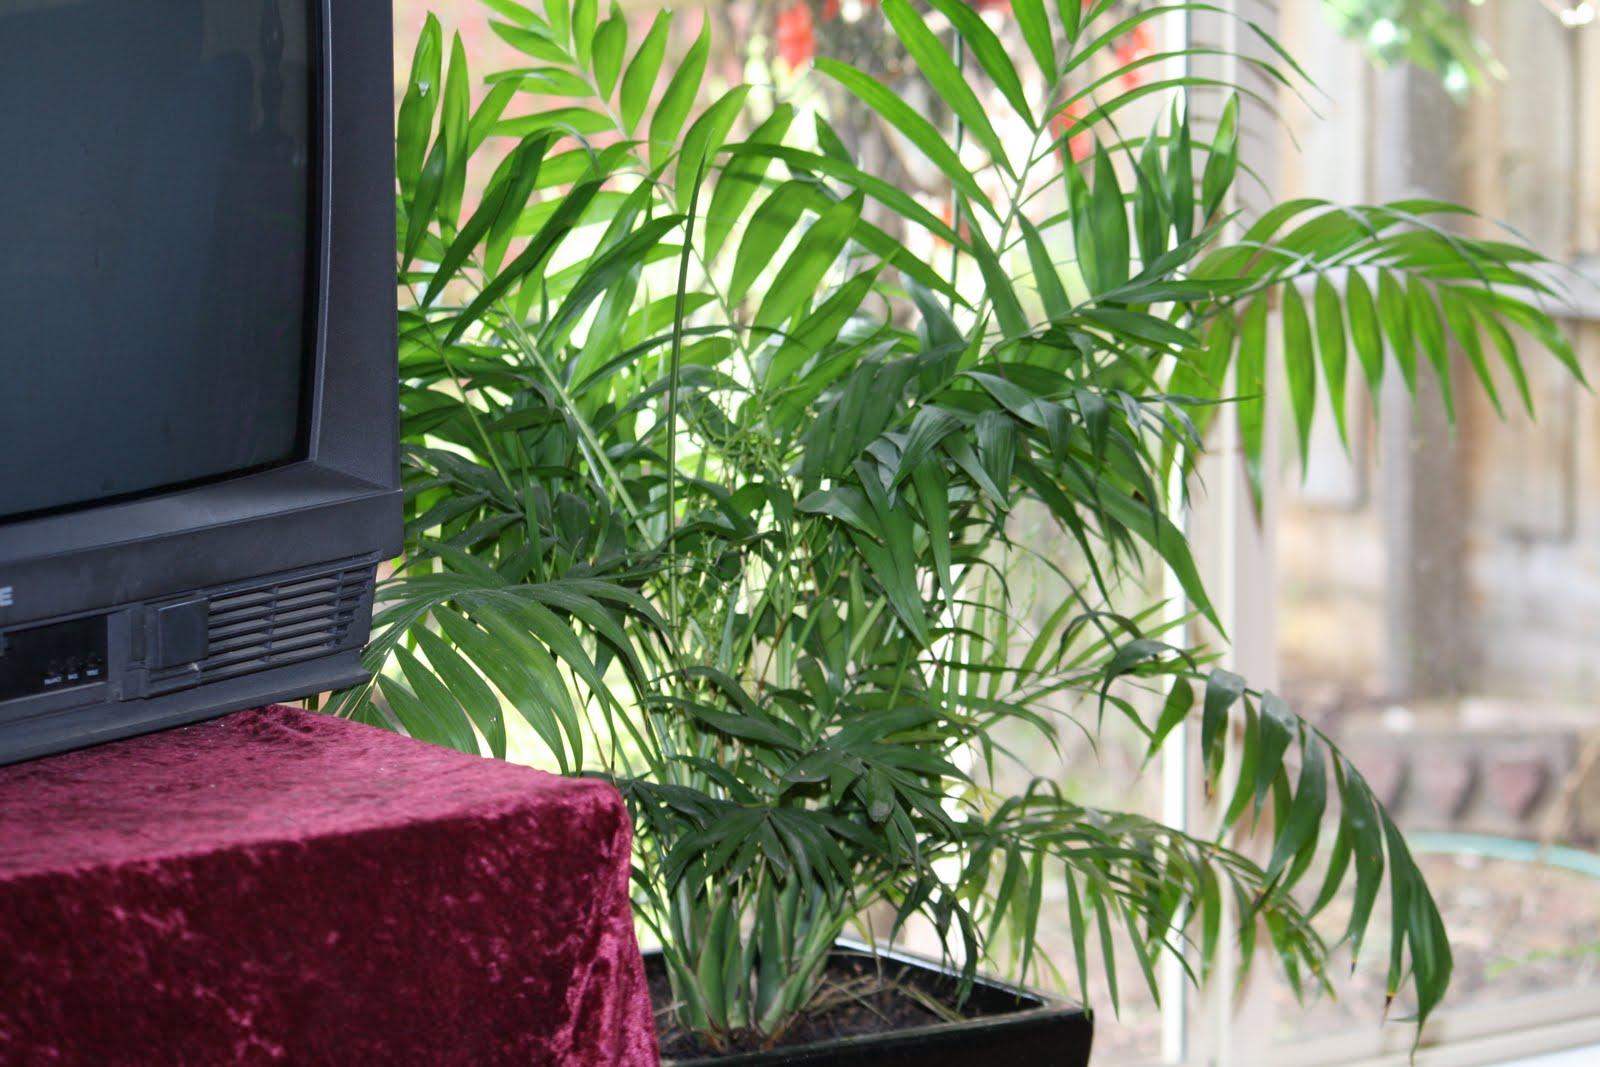 Http Veggiegobbler Blogspot Com 2010 09 Indoor Plants Not Just Aesthetics Html